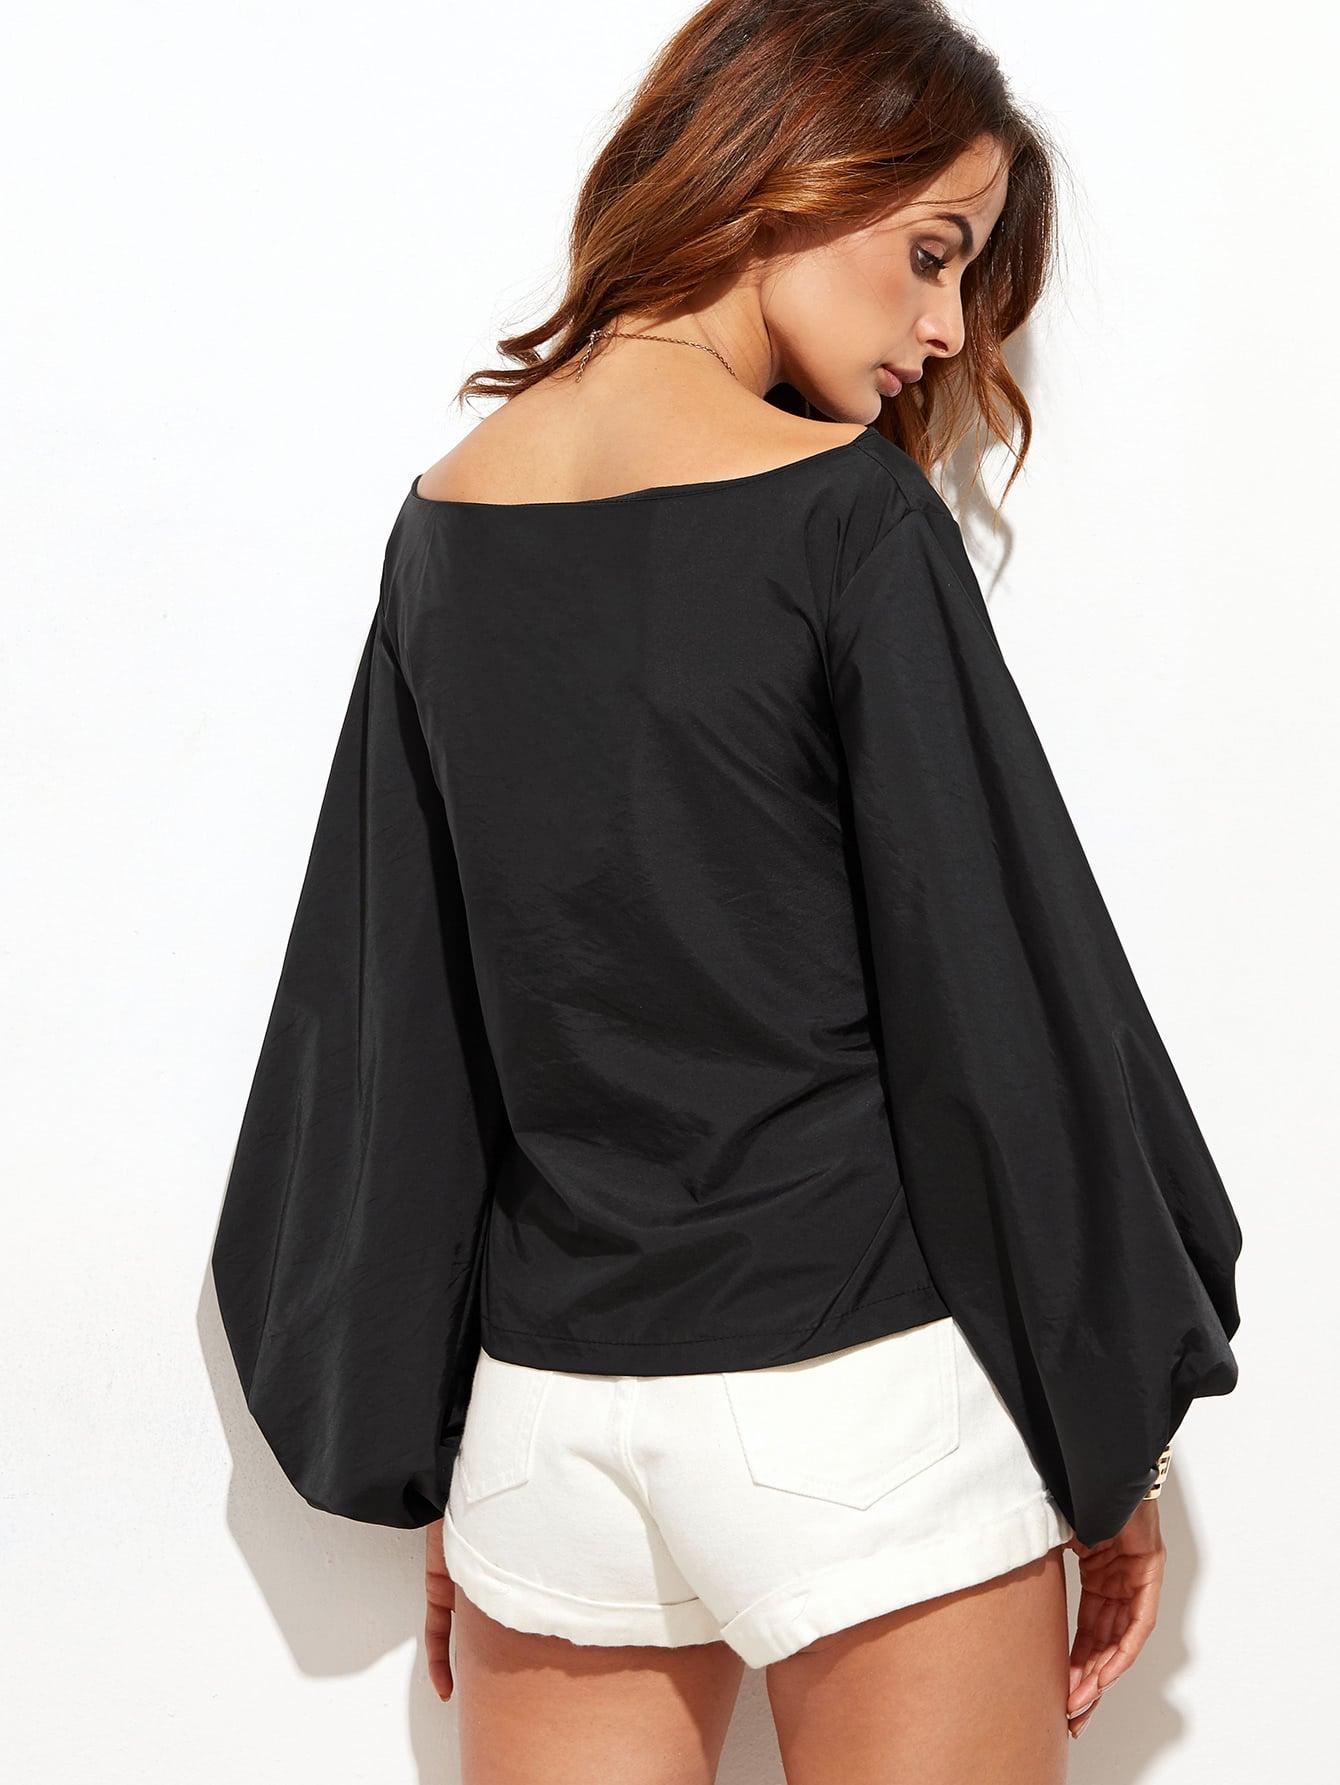 blouse160914103_1